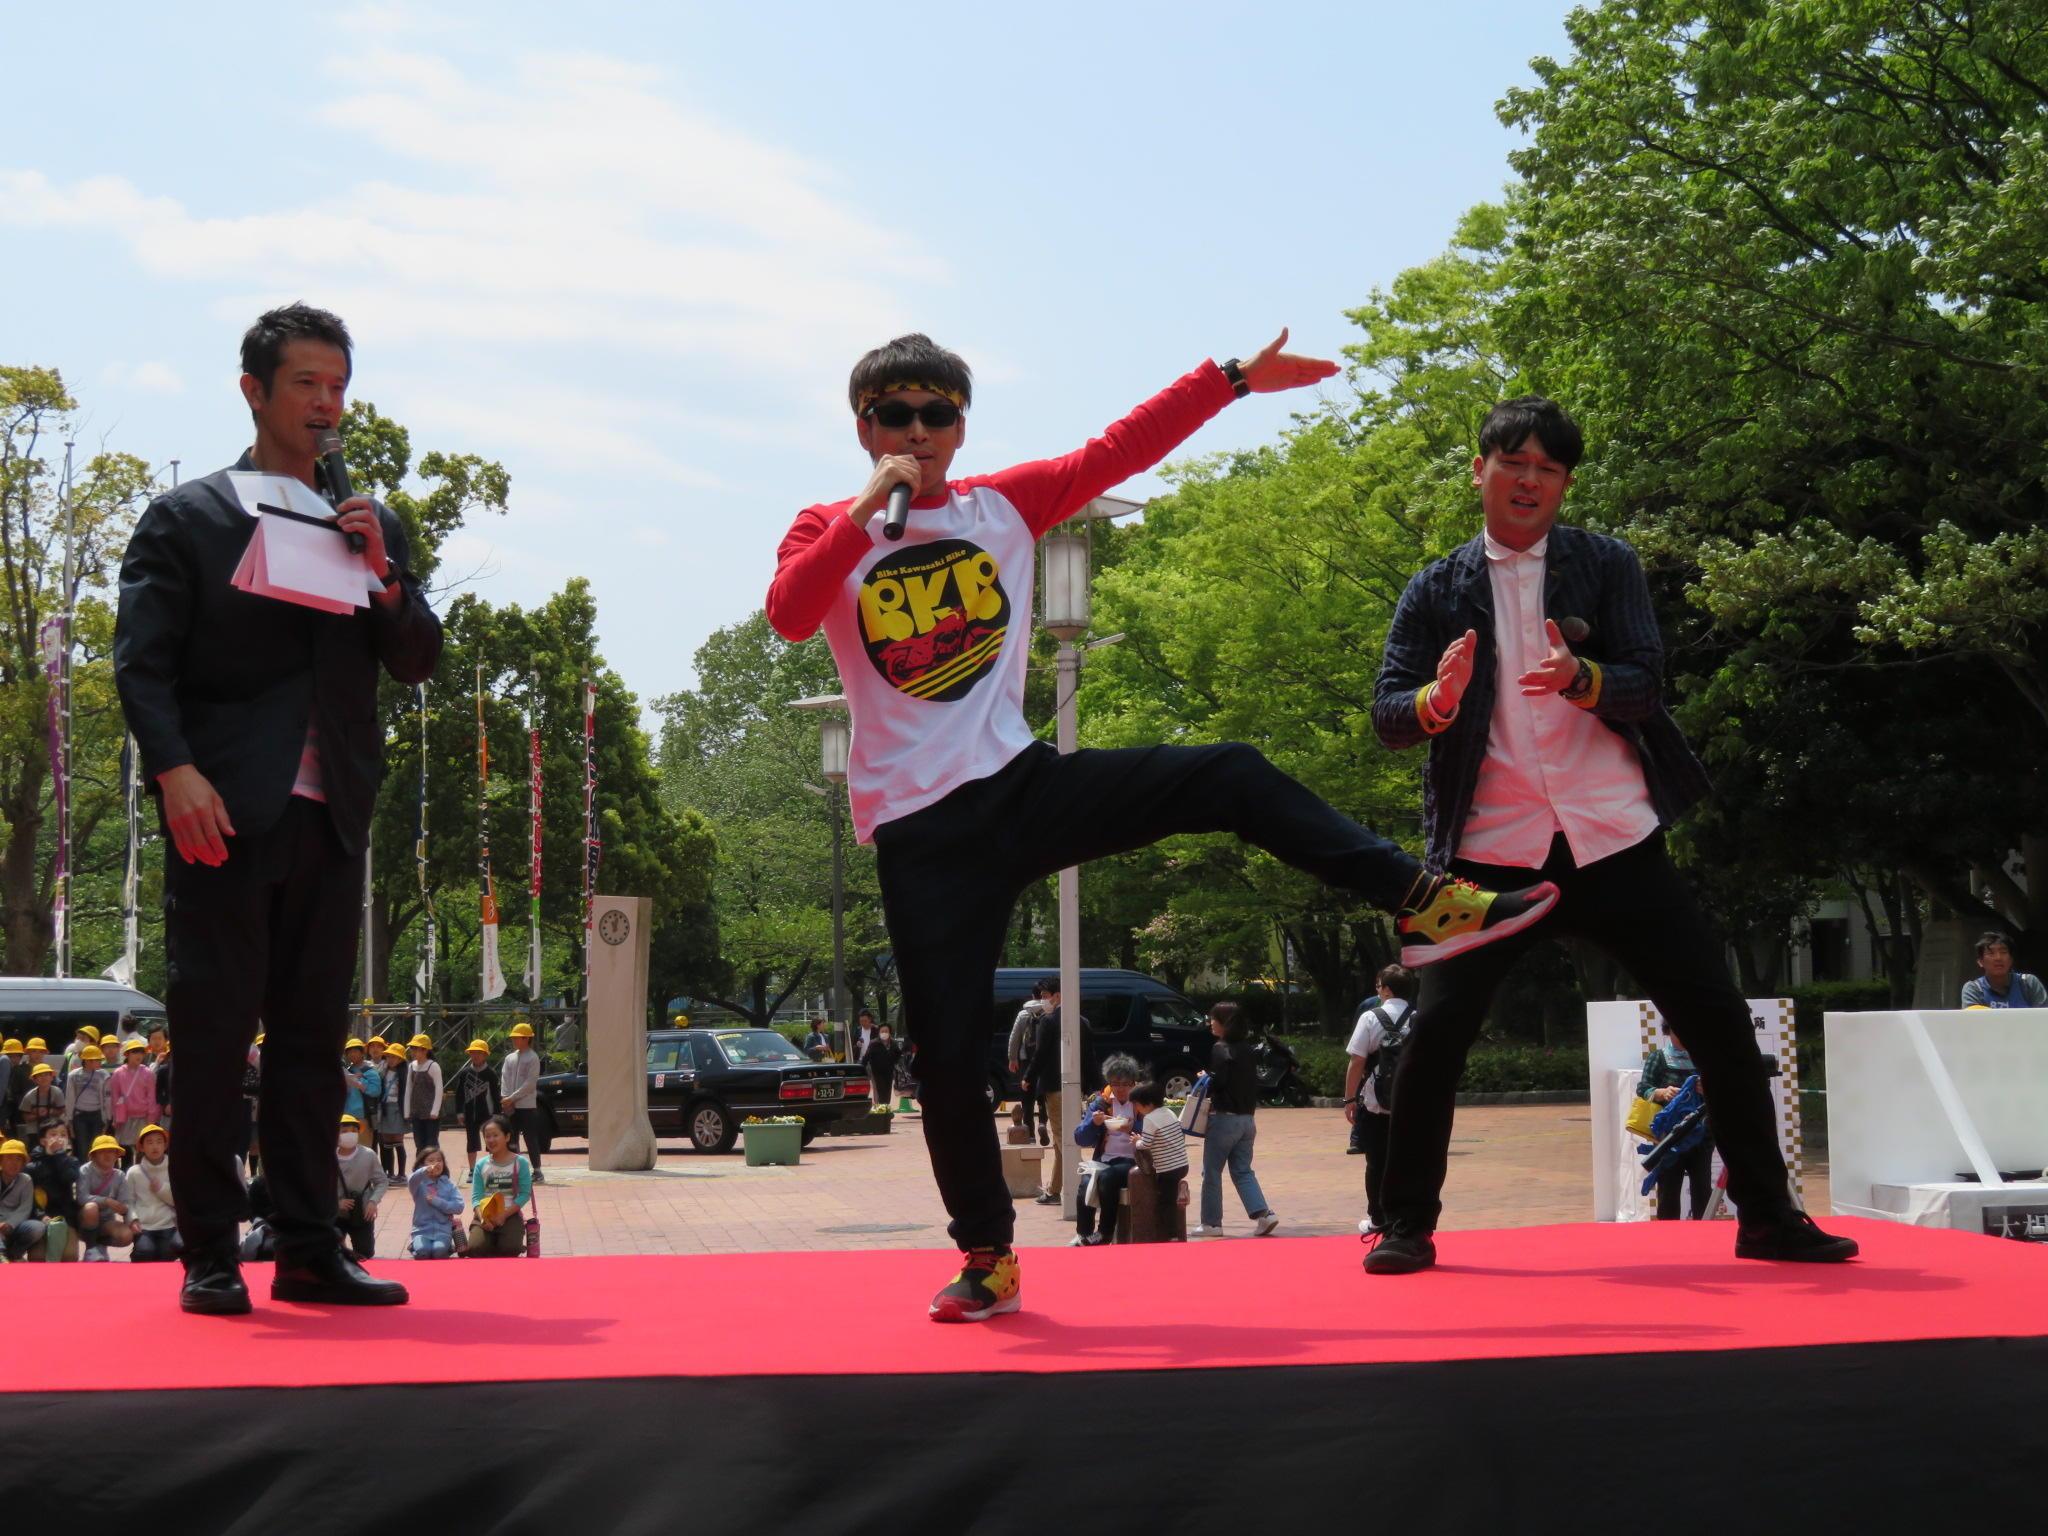 http://news.yoshimoto.co.jp/20180418191257-3a7dcaaa9d4aef54bc8643e657eaf325431fd50a.jpg